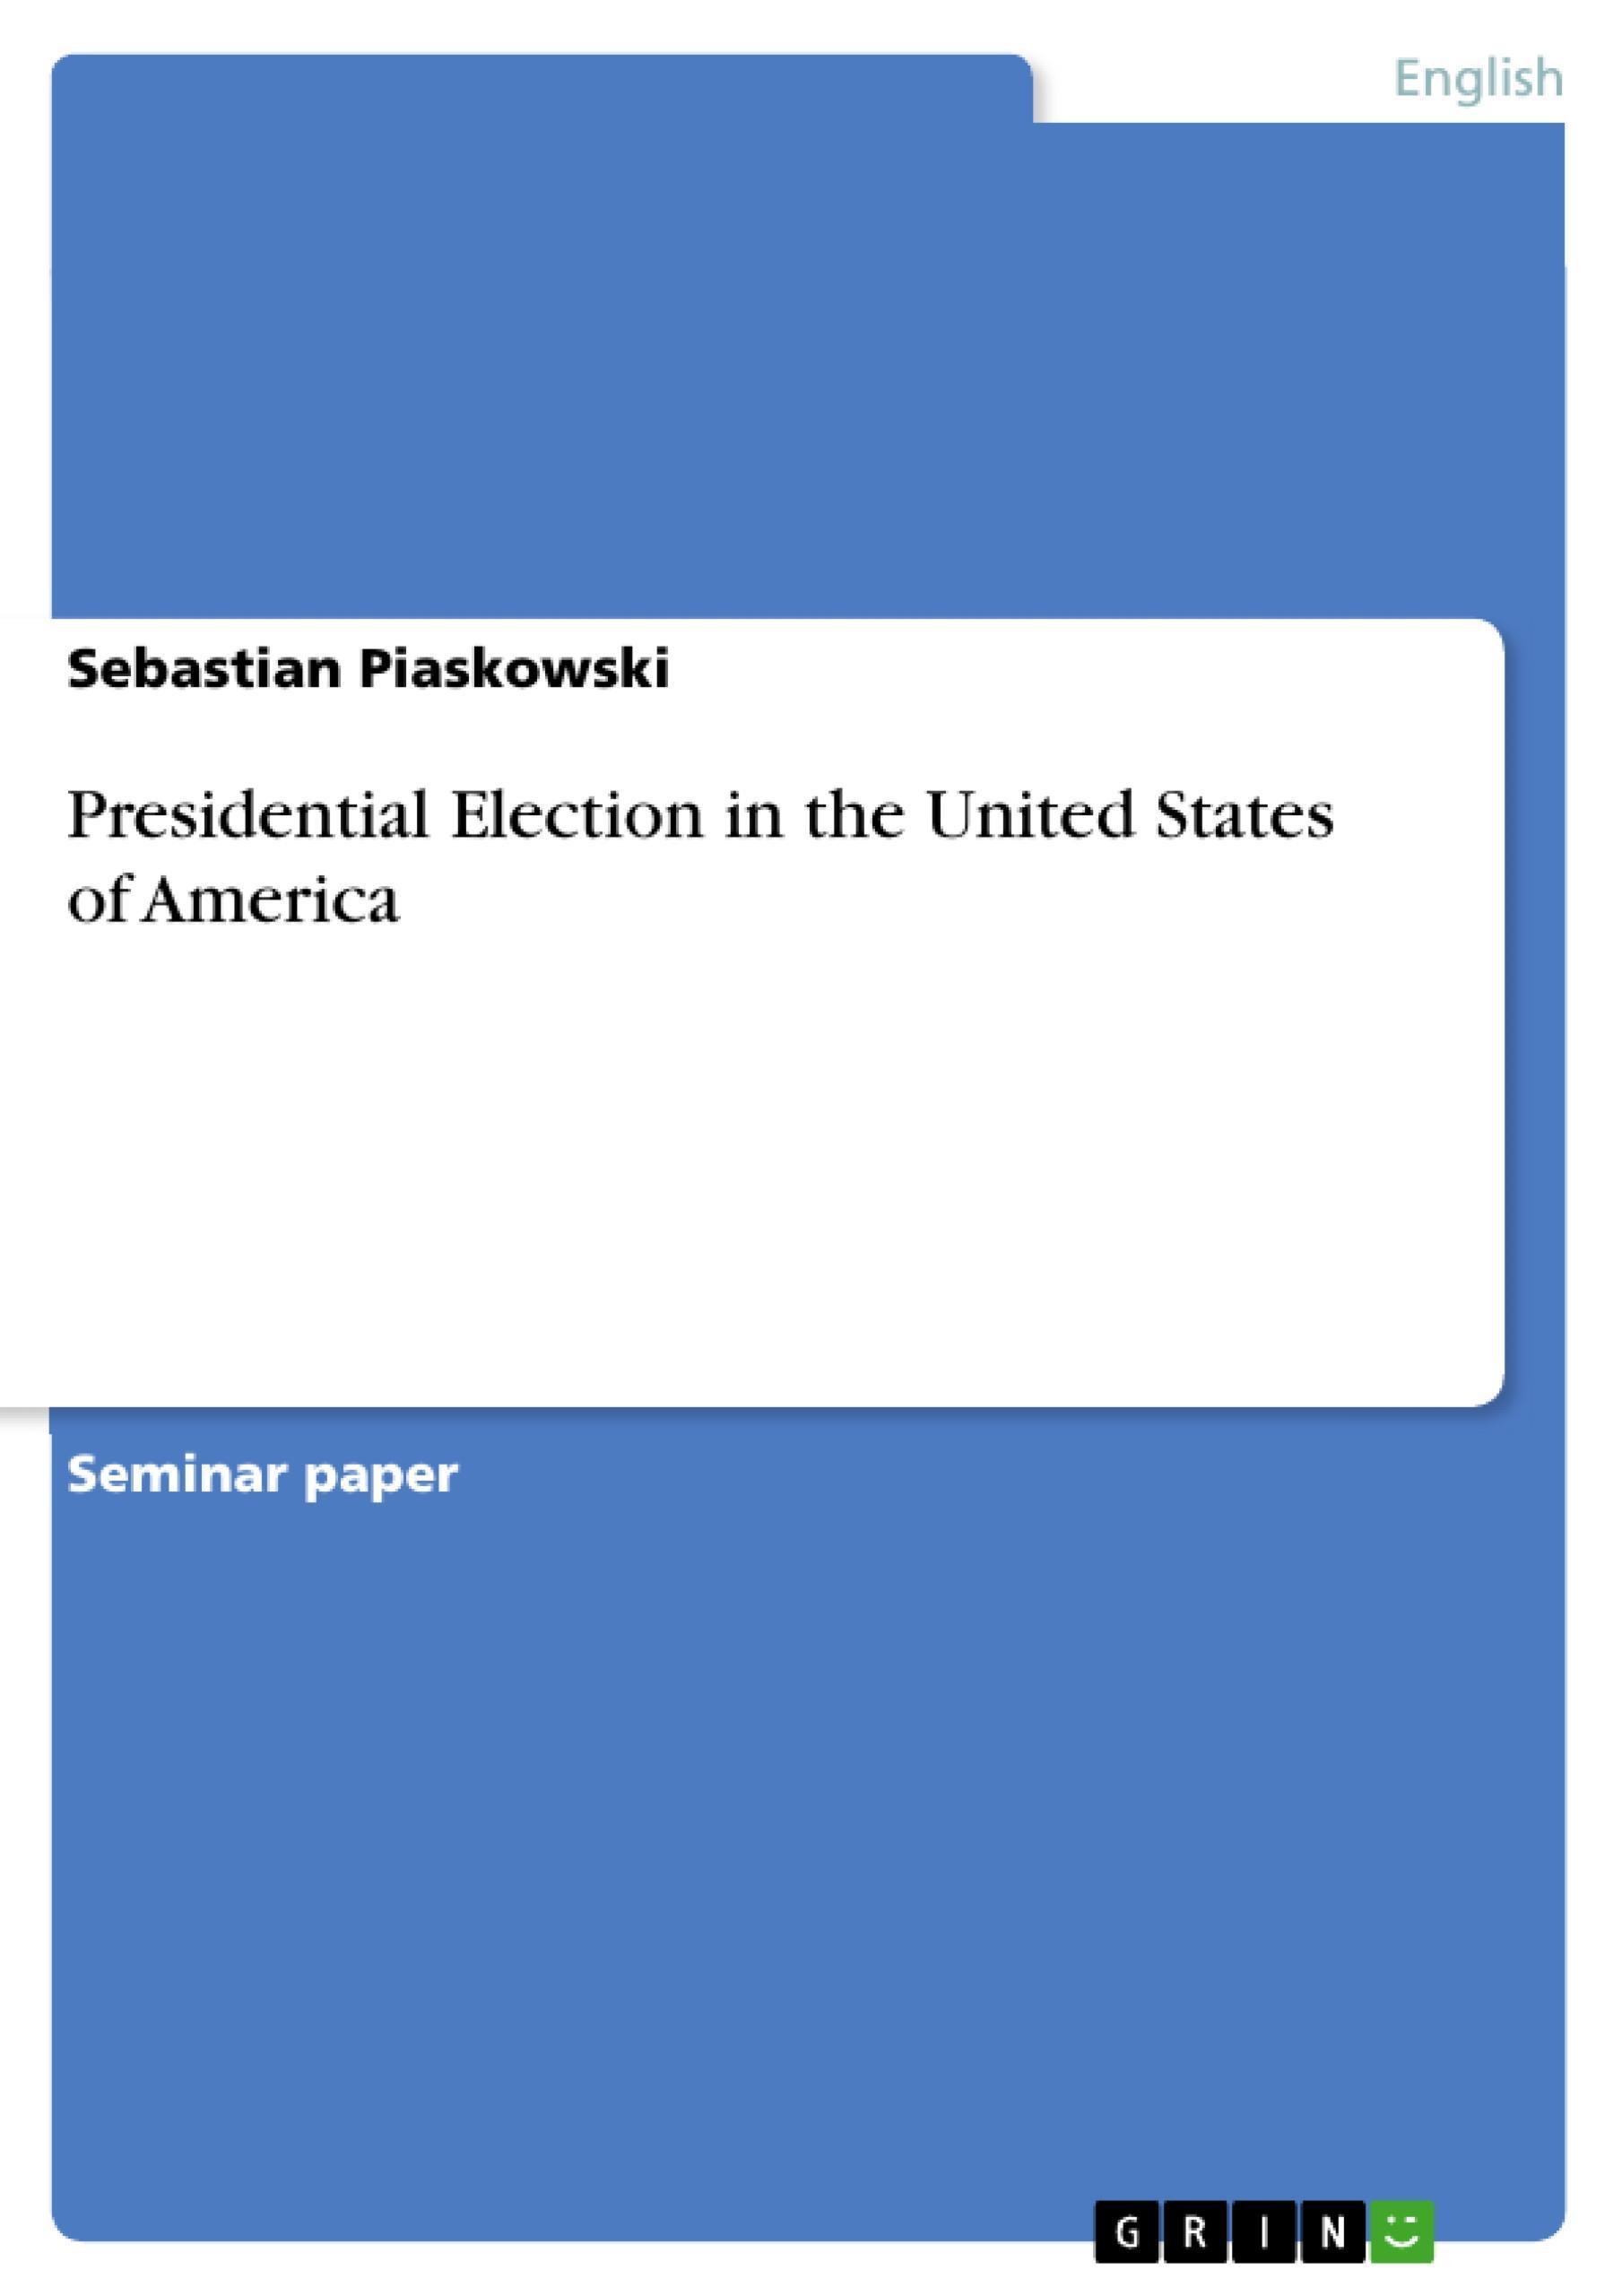 Presidential Election in the United States of America Sebastian Piaskowski